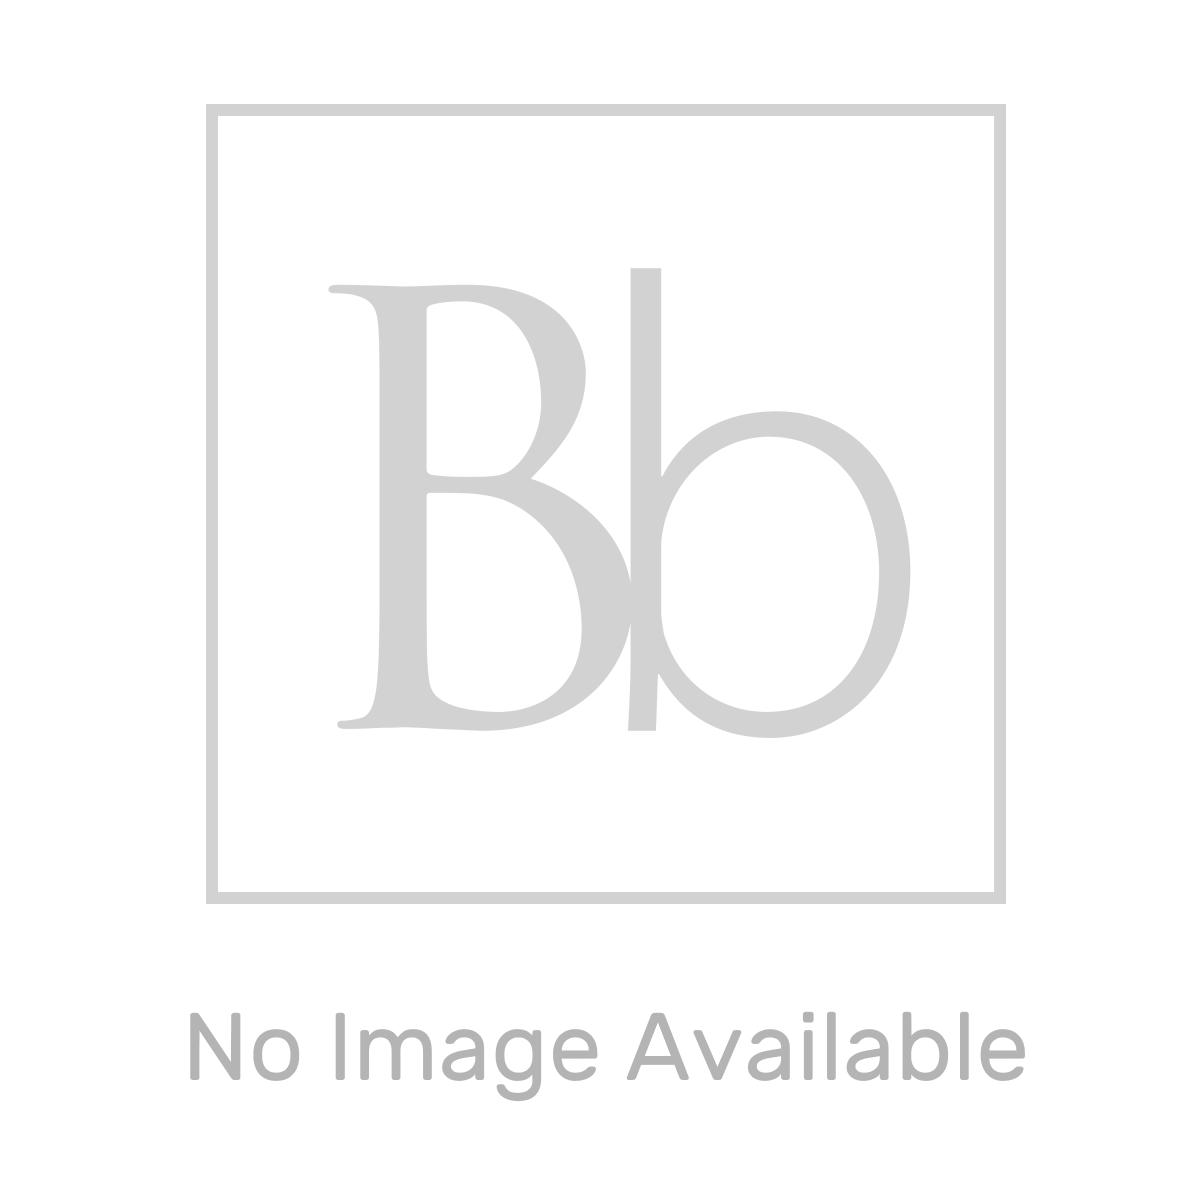 RAK Series 600 Toilet and 400 Series Black Ash Vanity Unit